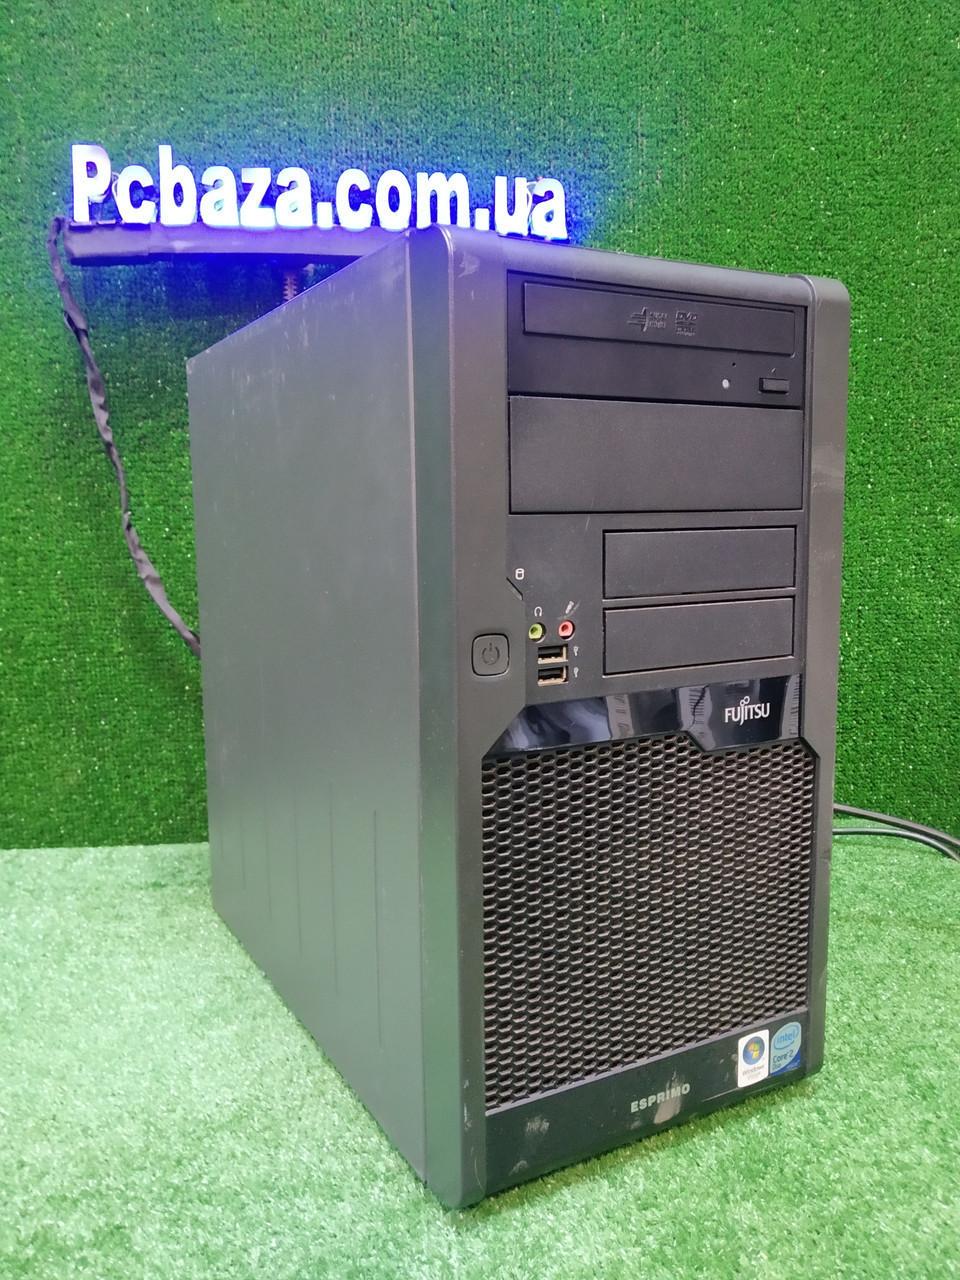 Игровой ПК Fujitsu, Intel 2 мощных ядра E8400 3.0 Ггц, 4 ГБ, 500 ГБ, Quadro 2000 1 GB (GTS 450)